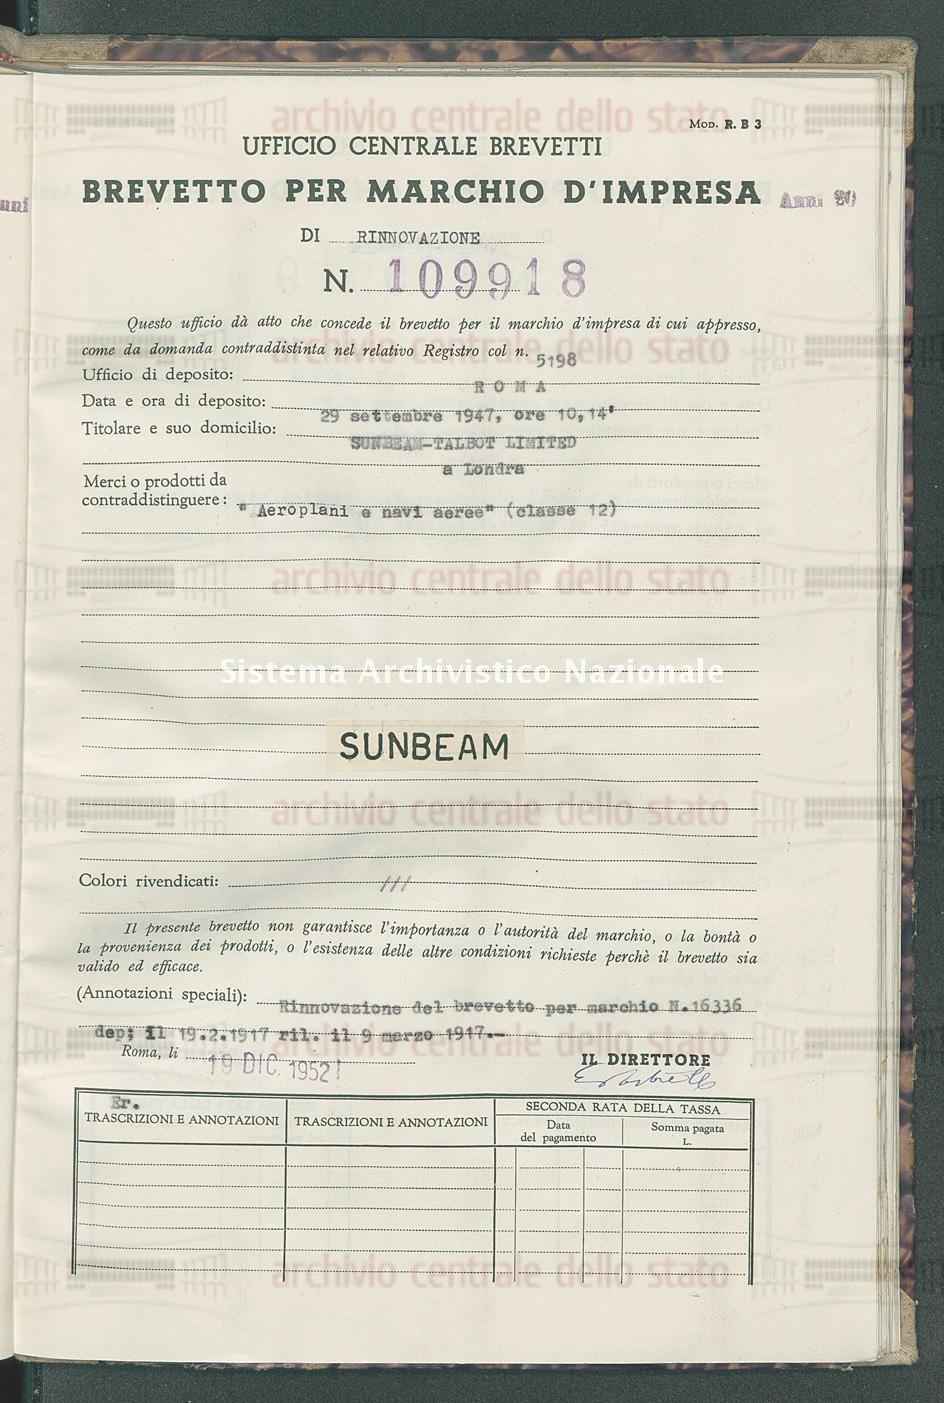 'Aereoplani e navi aeree' Sunbeam-Talbot Limited (19/12/1952)